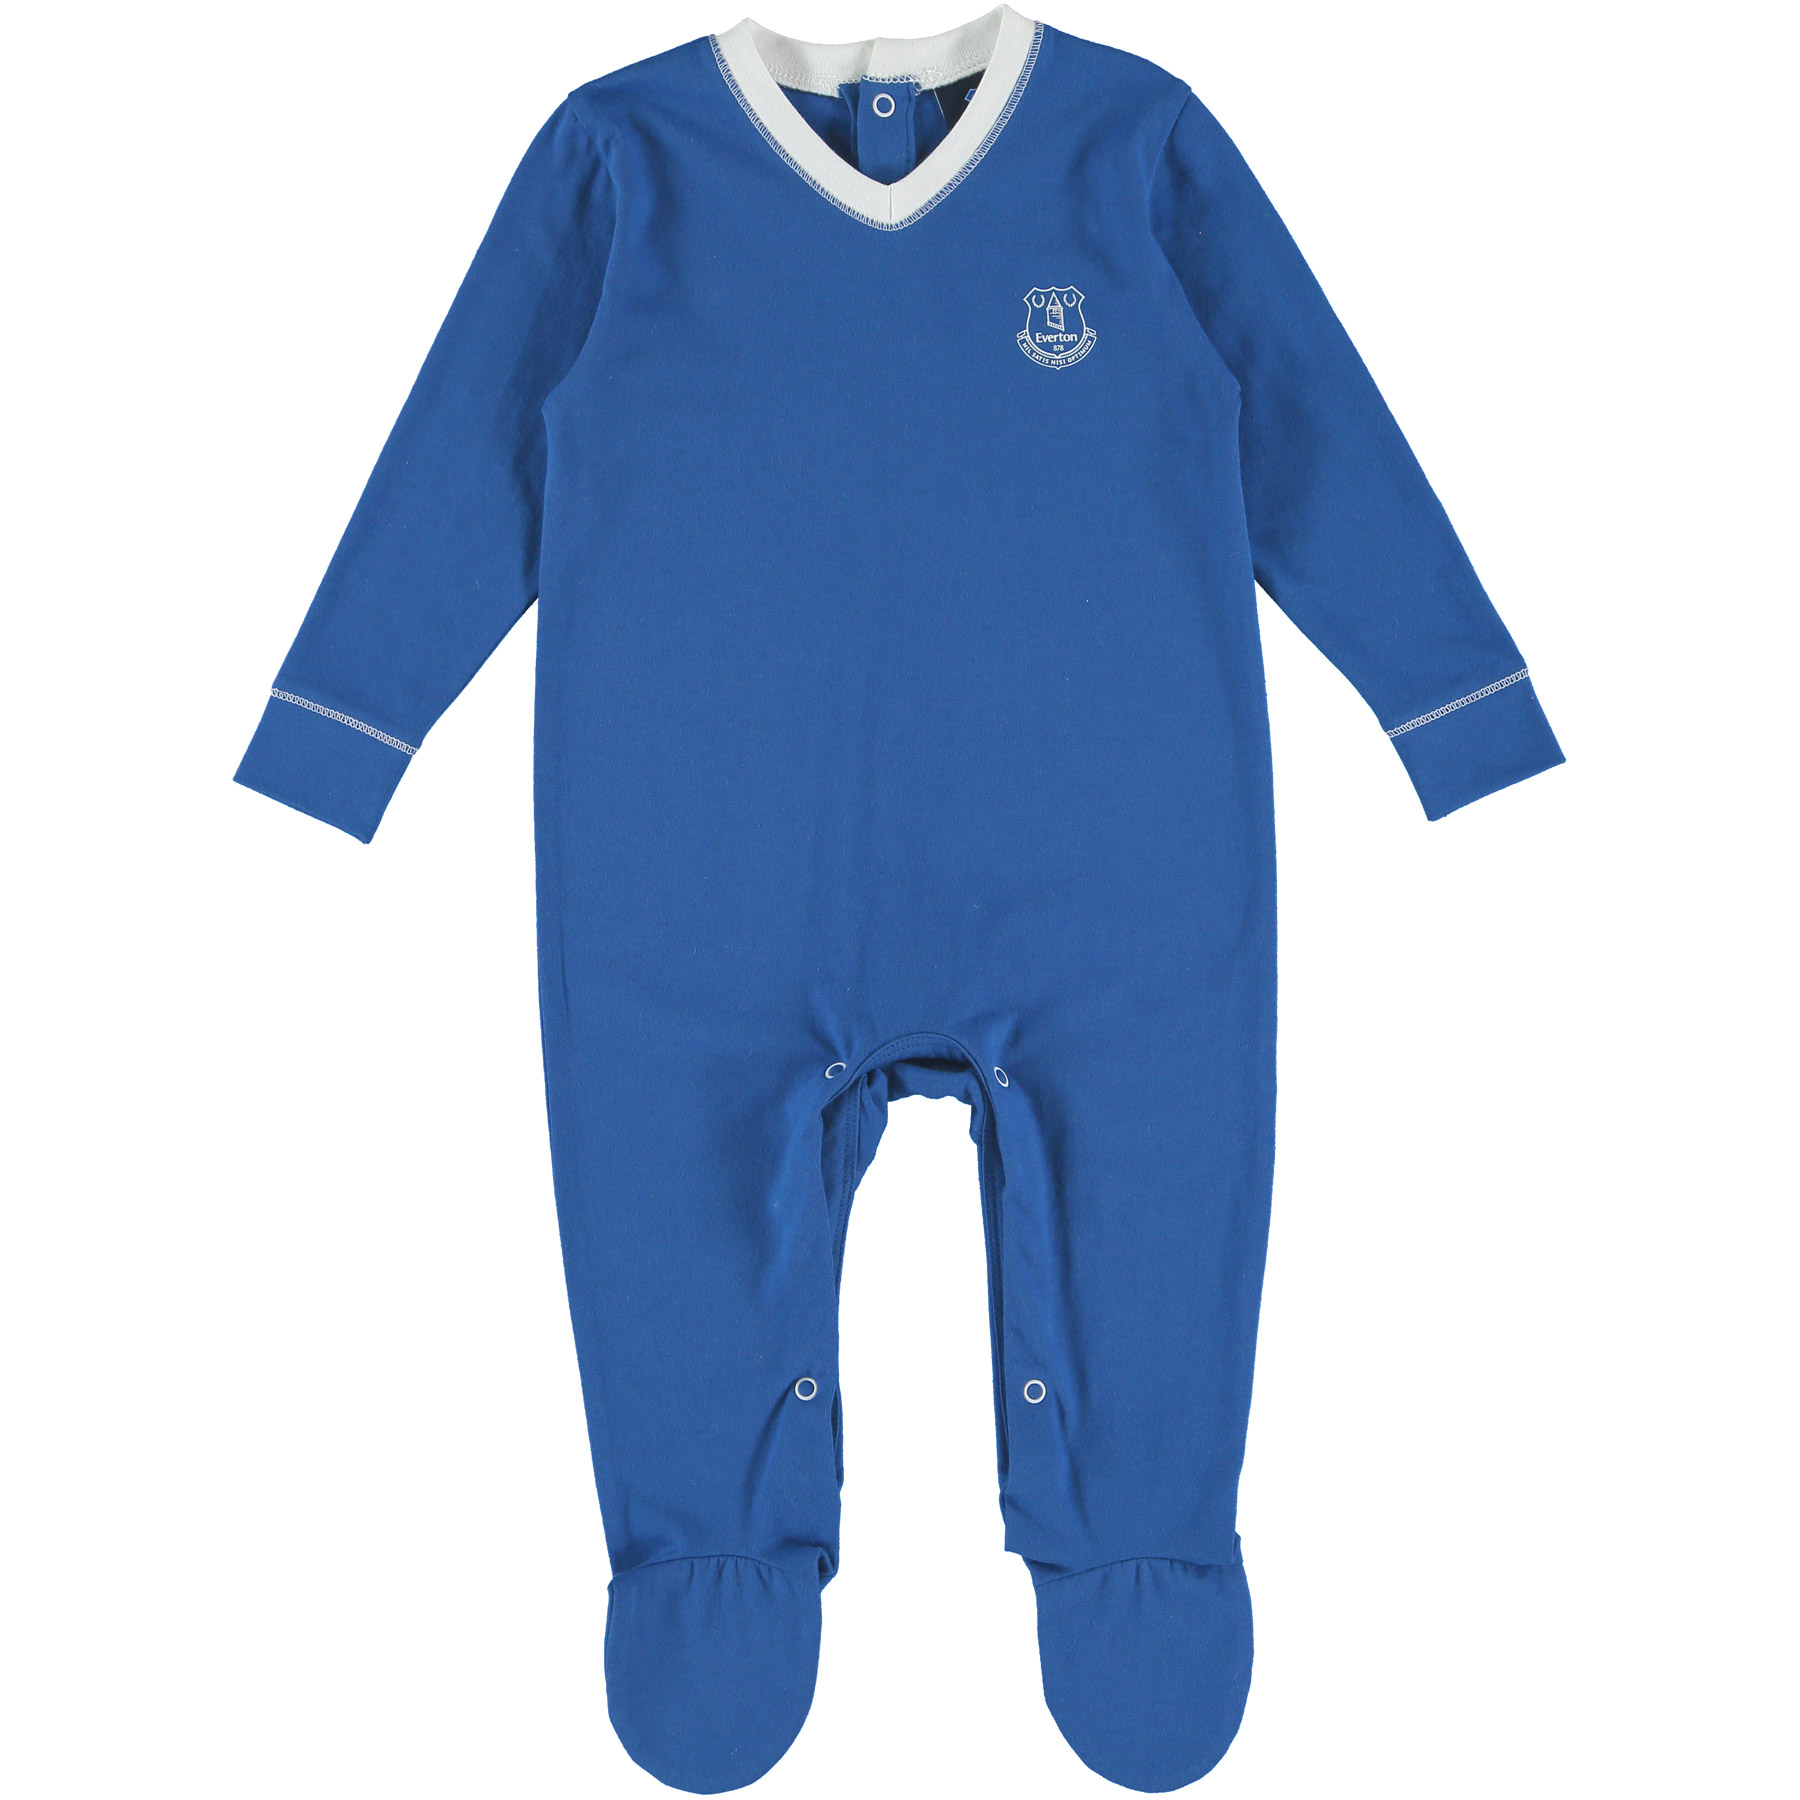 Everton 15/16 Kit Sleepsuit - Everton Blue - Baby